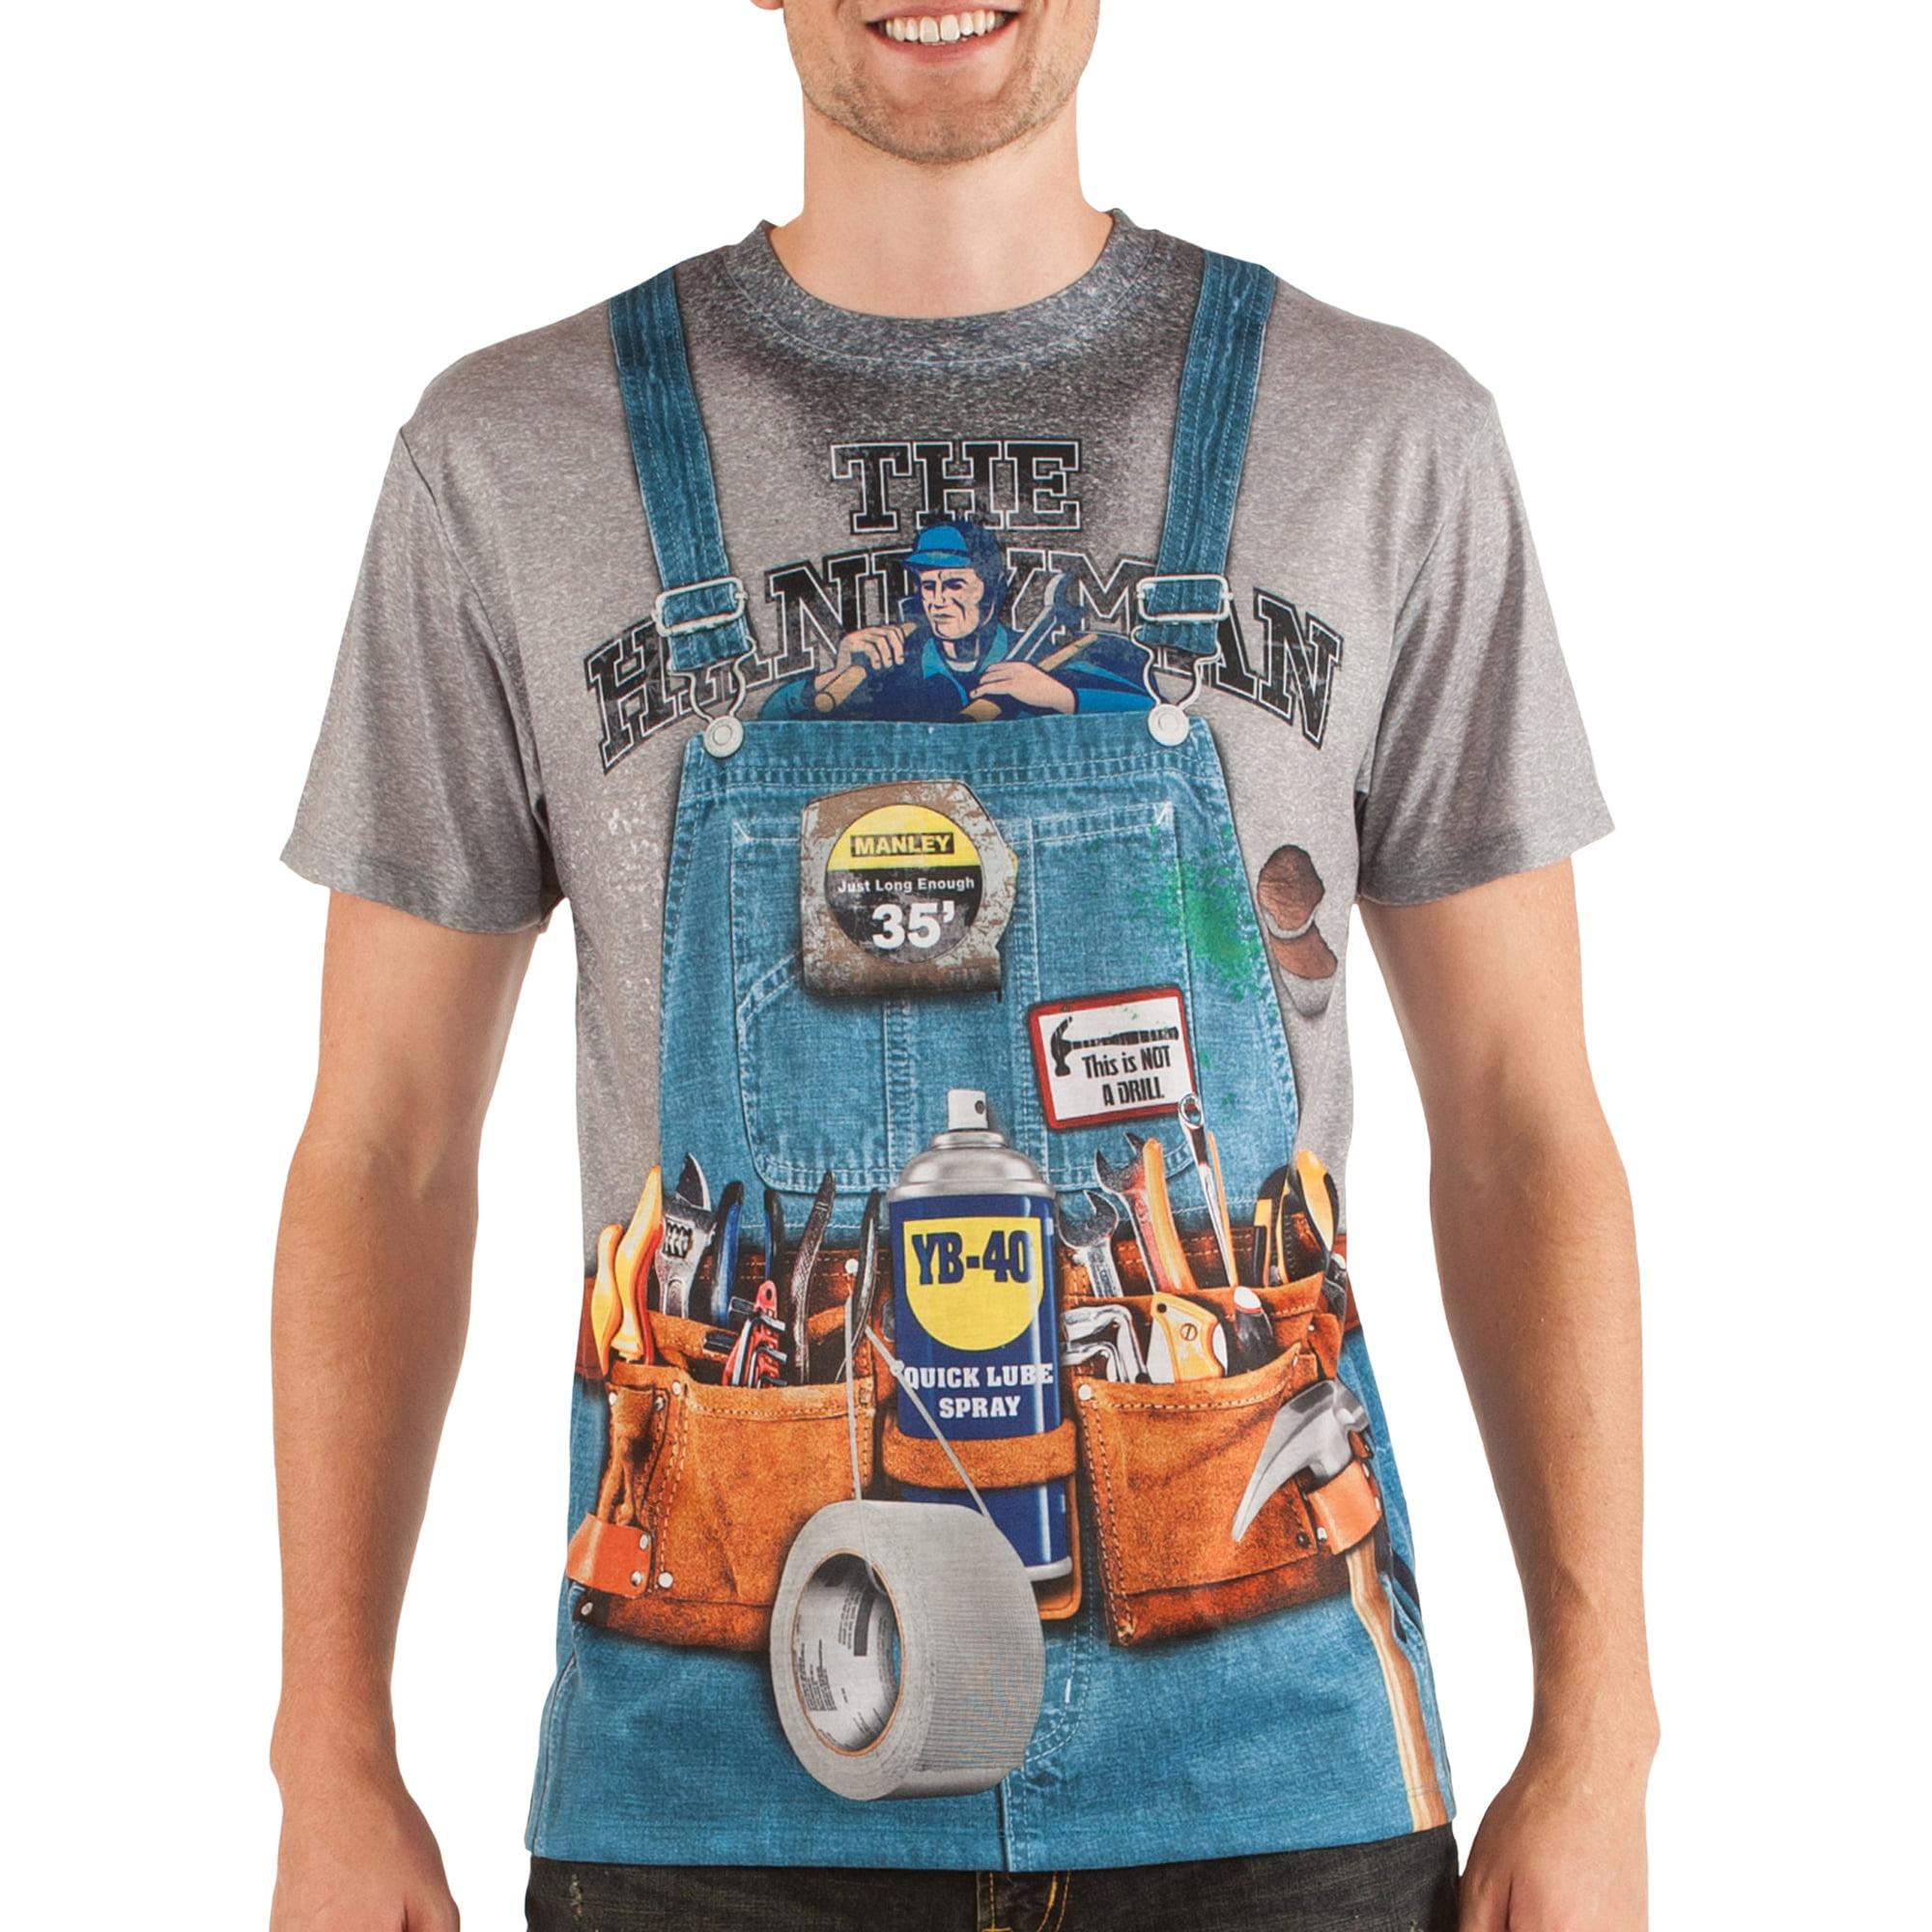 Handyman Men's Short Sleeve Tee Shirt